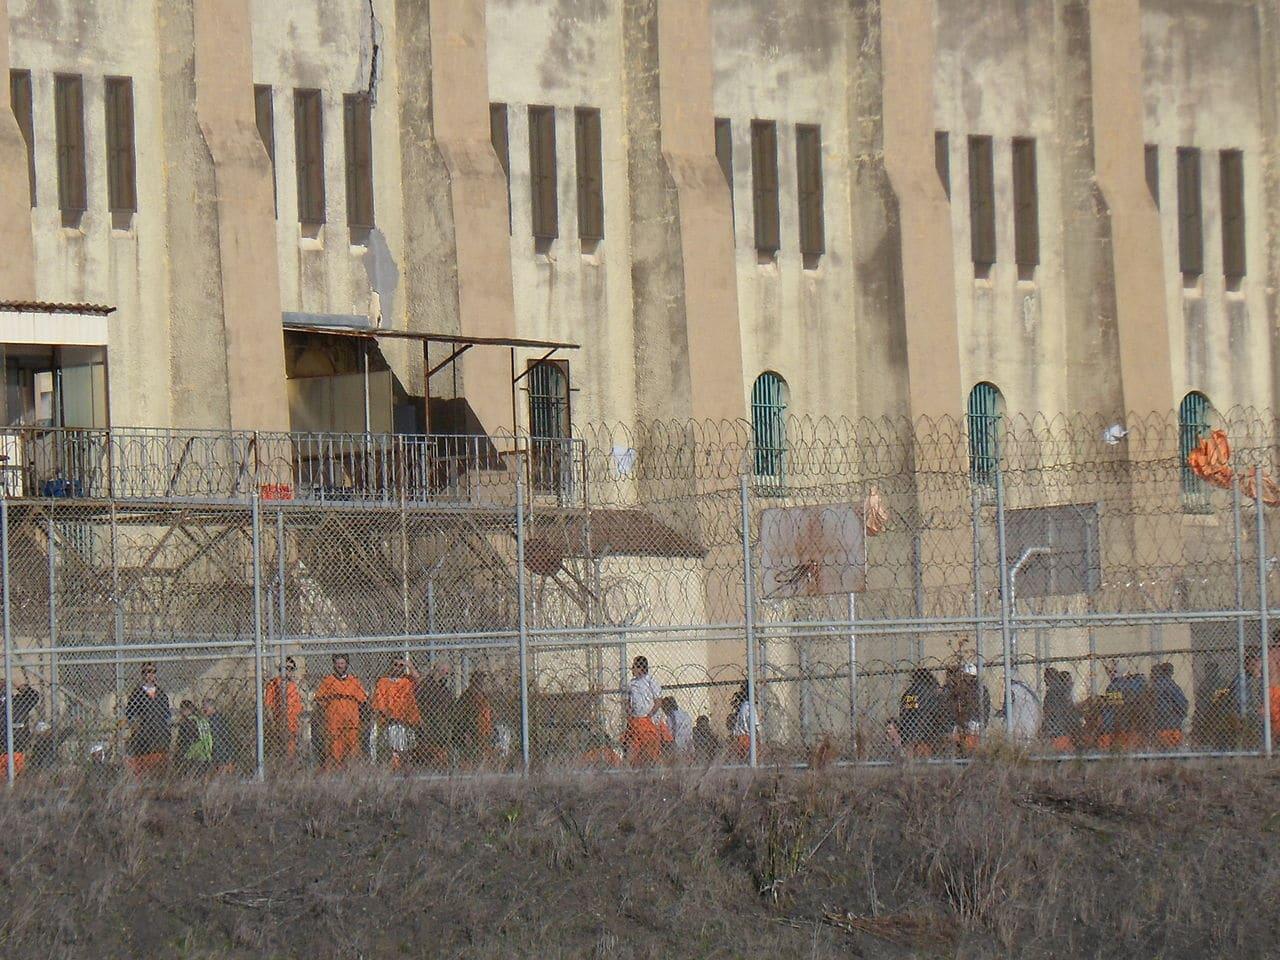 CA releasing up to 17,600 prisoners over coronavirus; murder convict already released